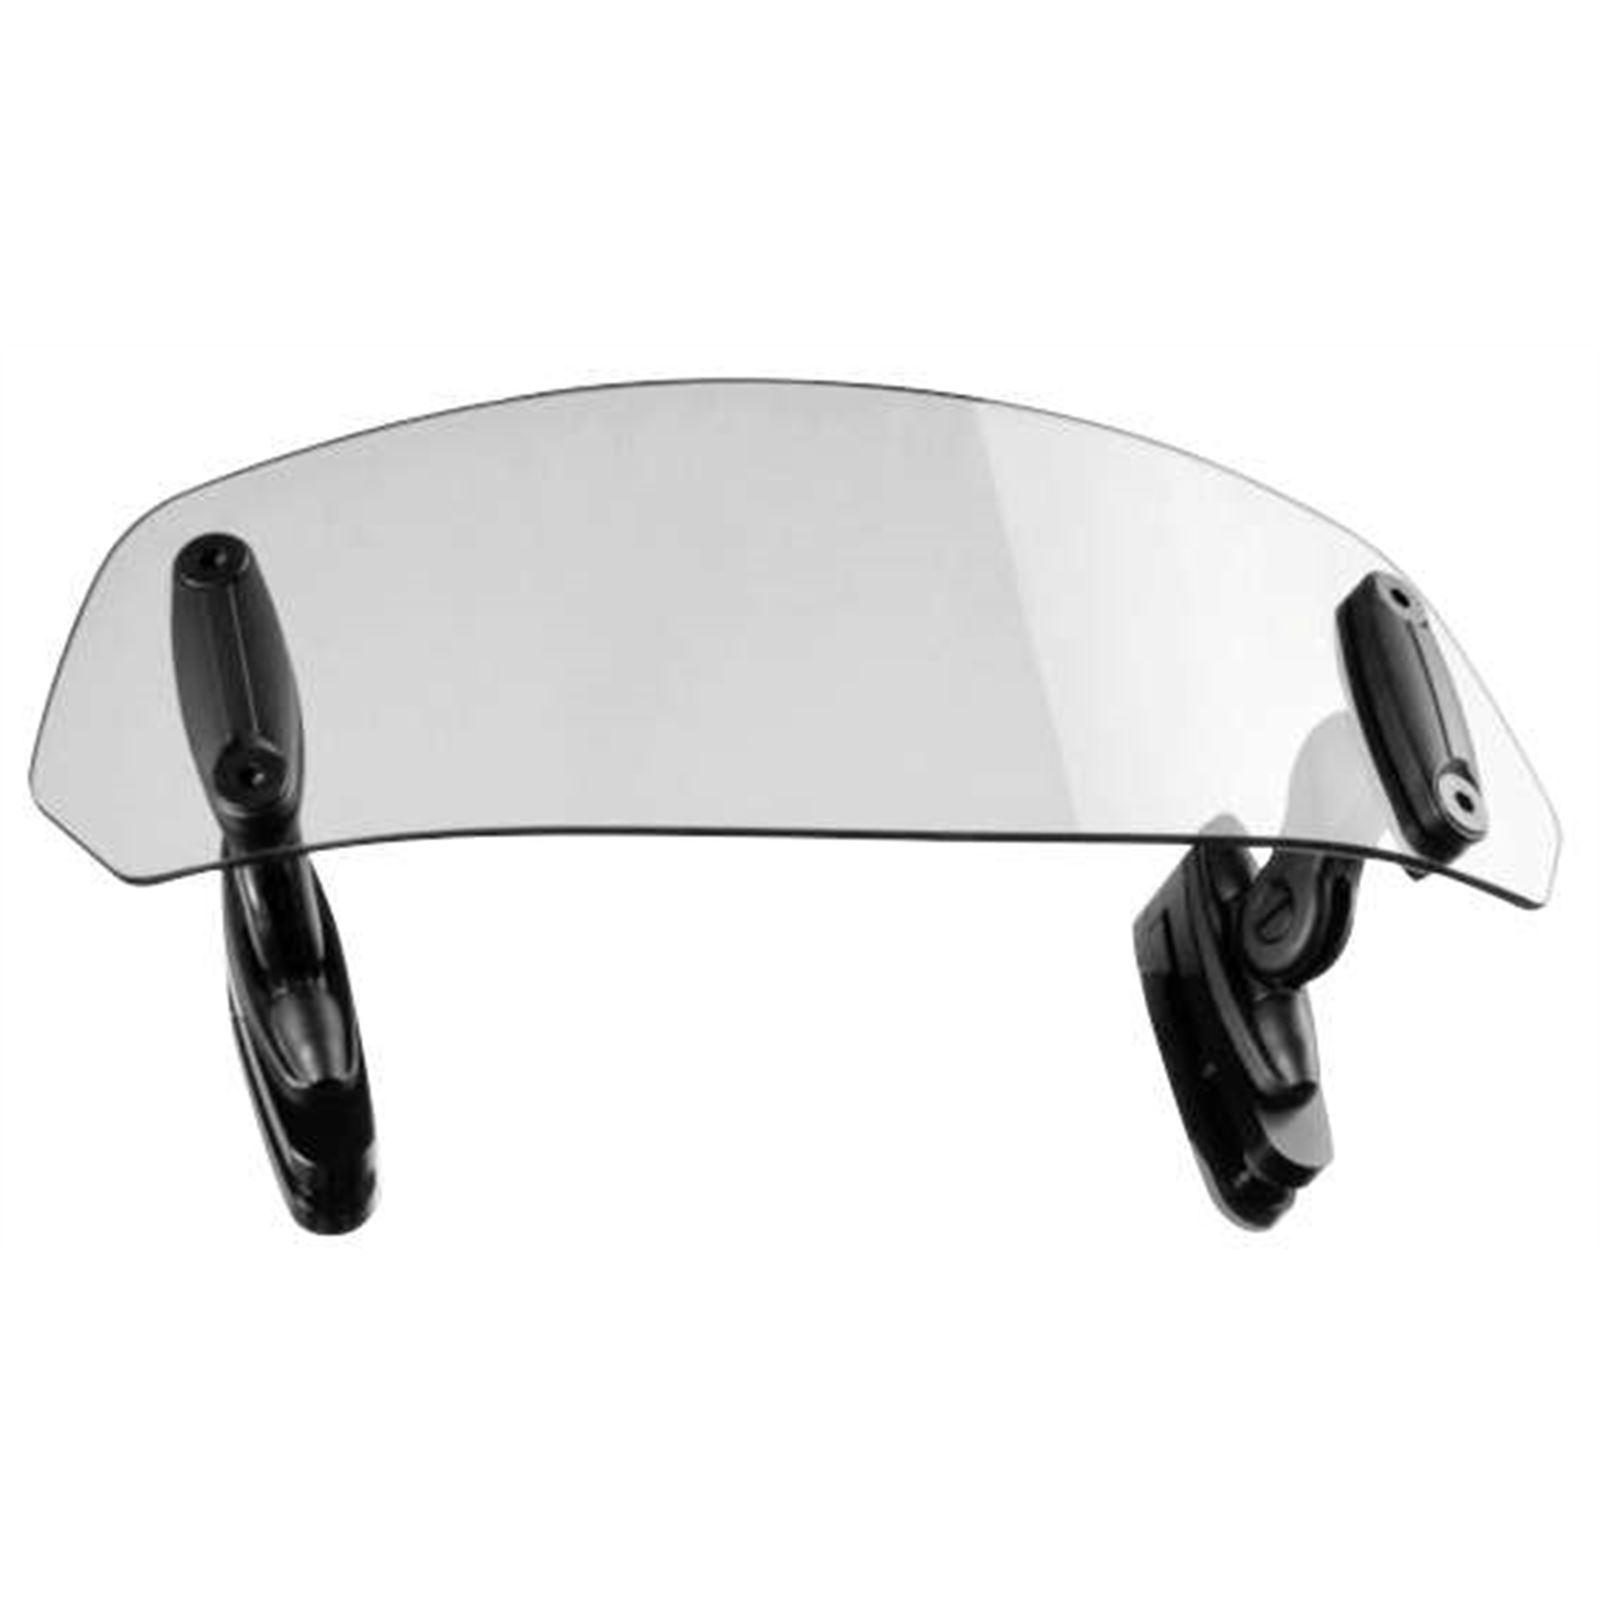 Puig Adjustable Clip-On Windshield Visor